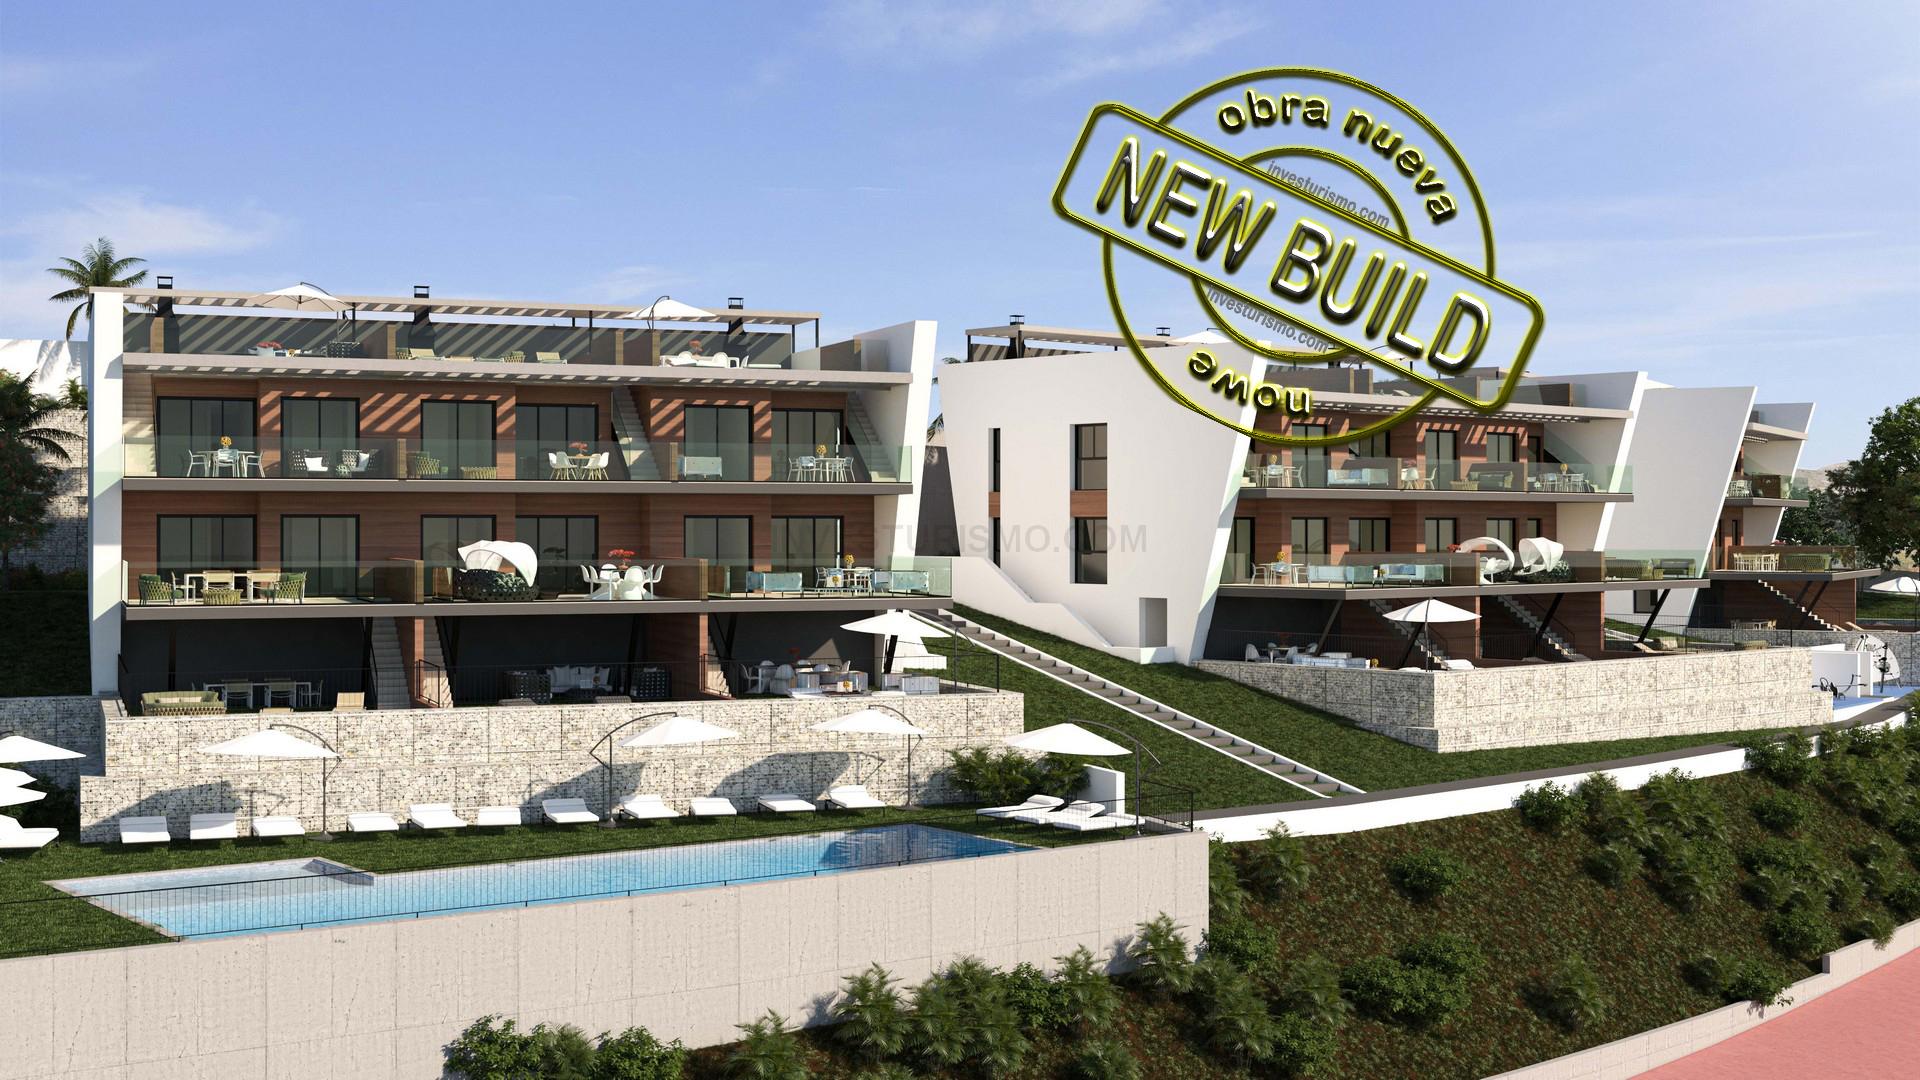 New Build bungalows 2 bedrooms in Finestrat